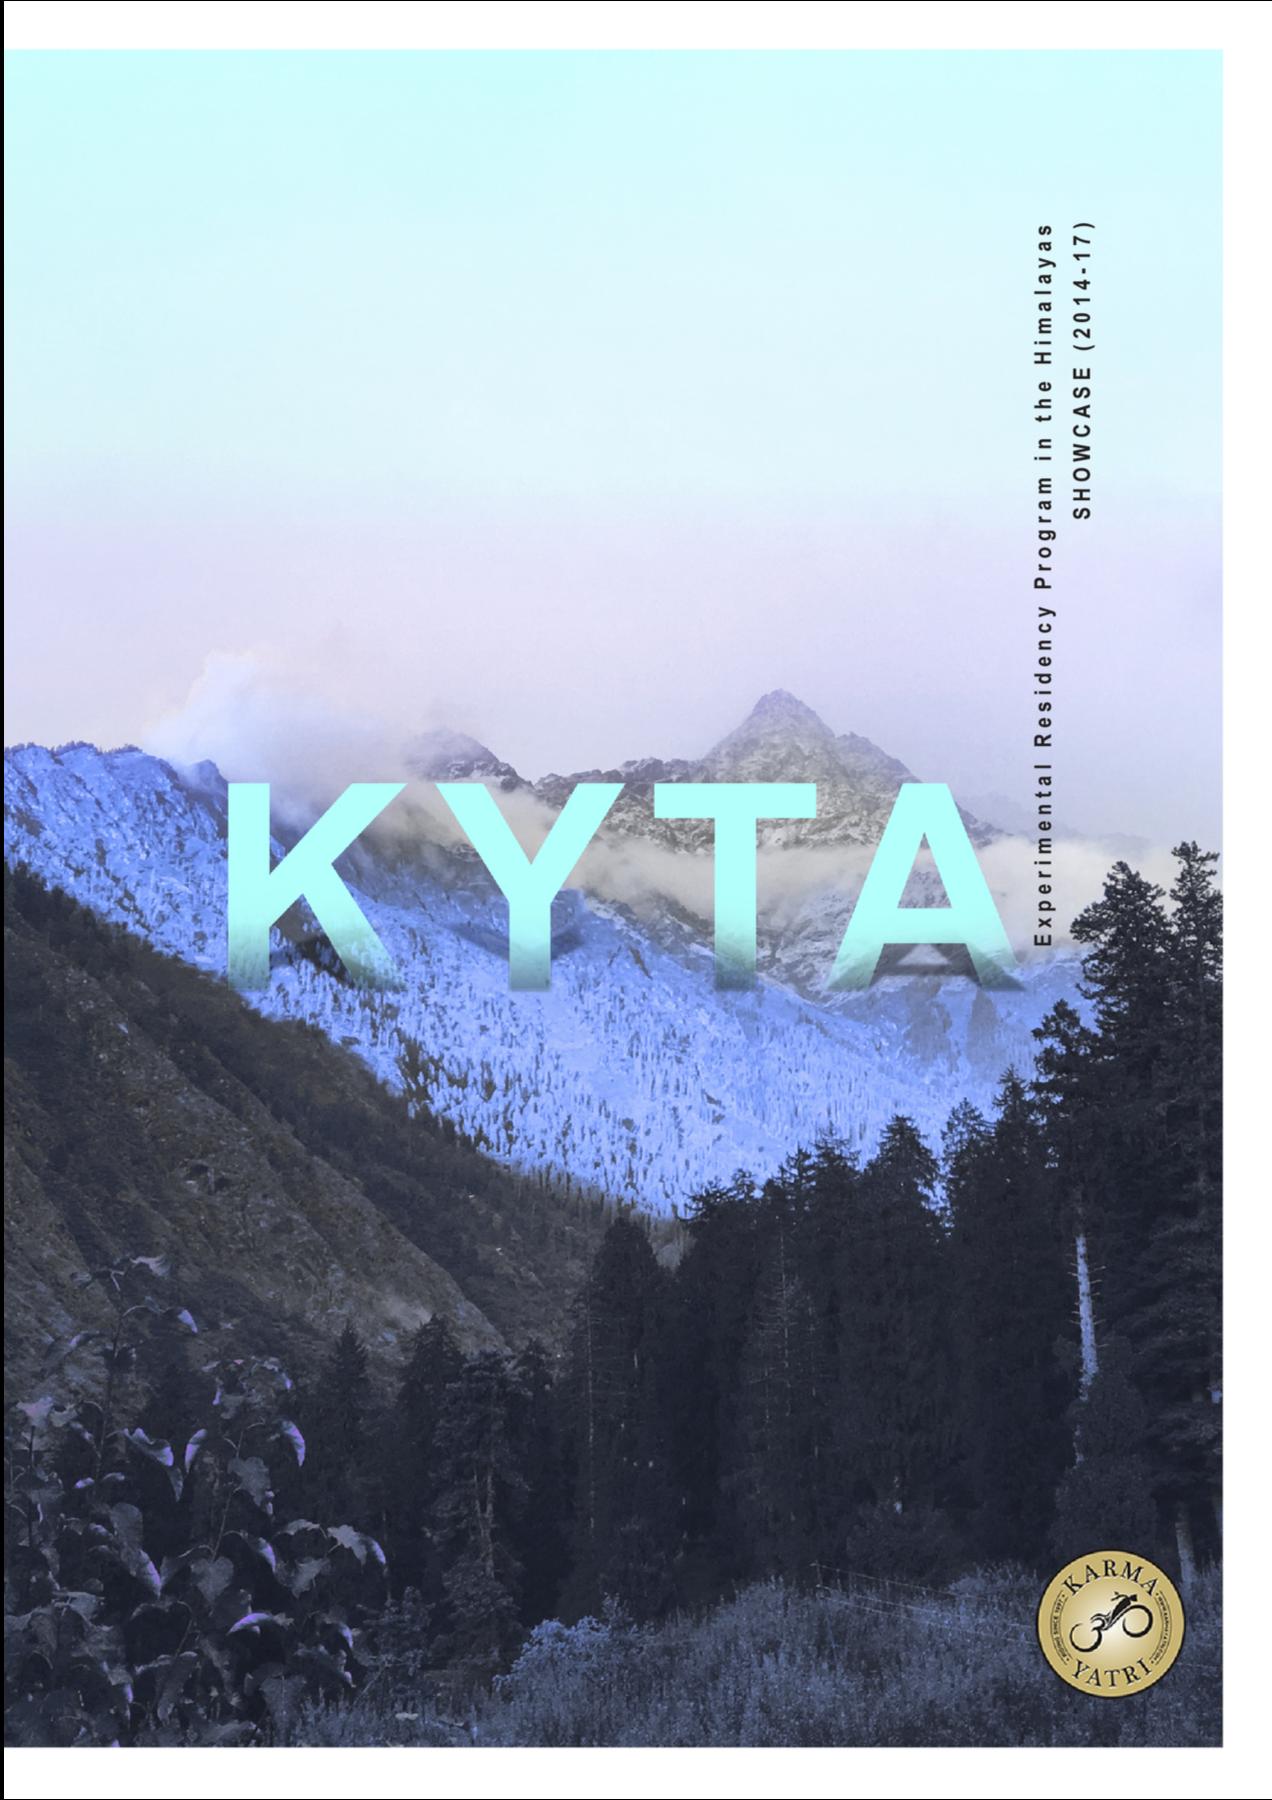 KYTA 2014-17 Catalog